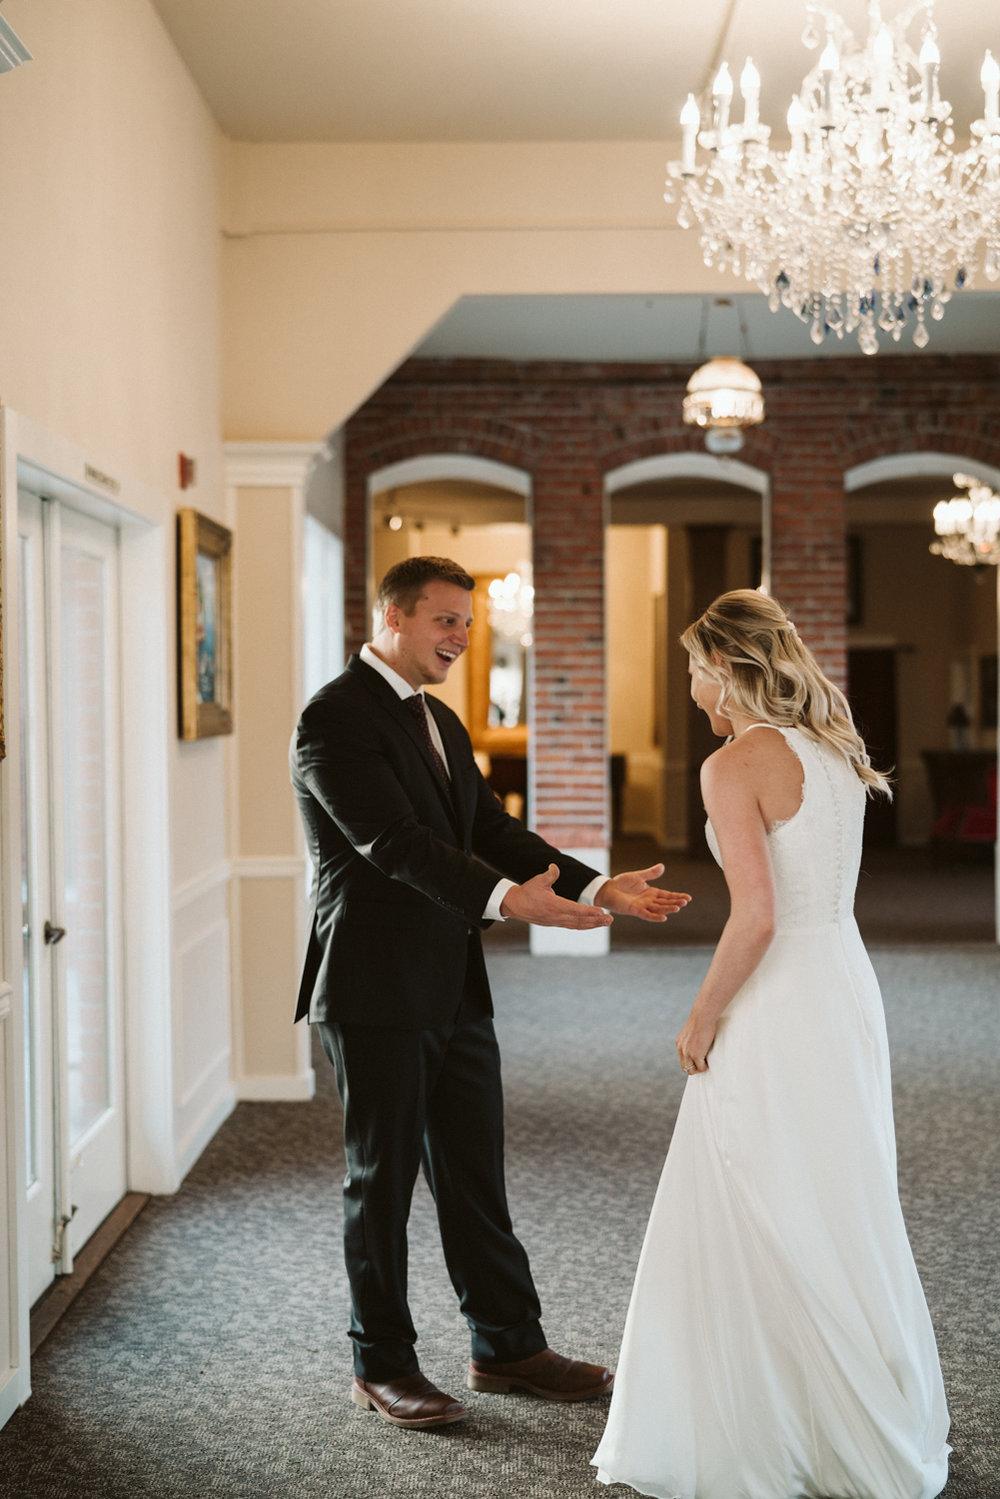 Intimate Winter Wedding | wedding day first look ideas | Seattle wedding photographer